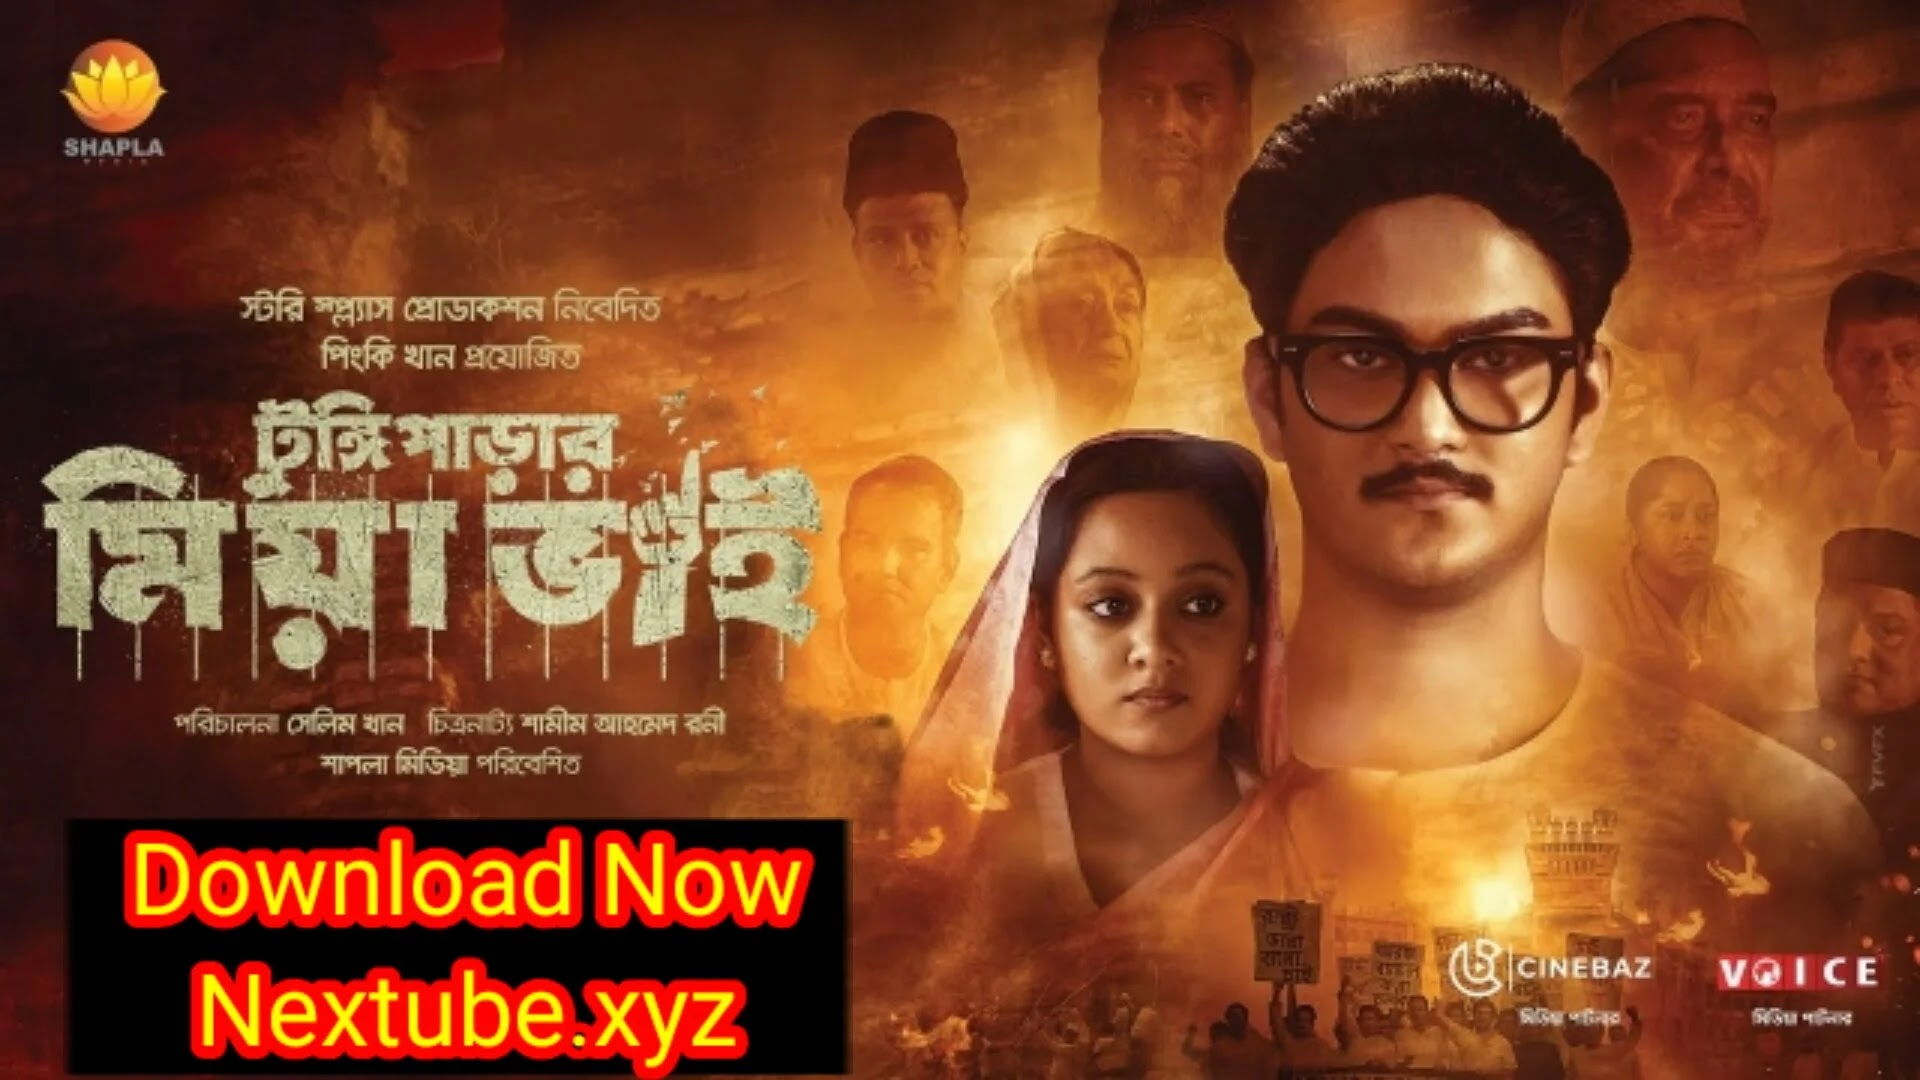 Tungi Parar Mia Bhai 2021 Download